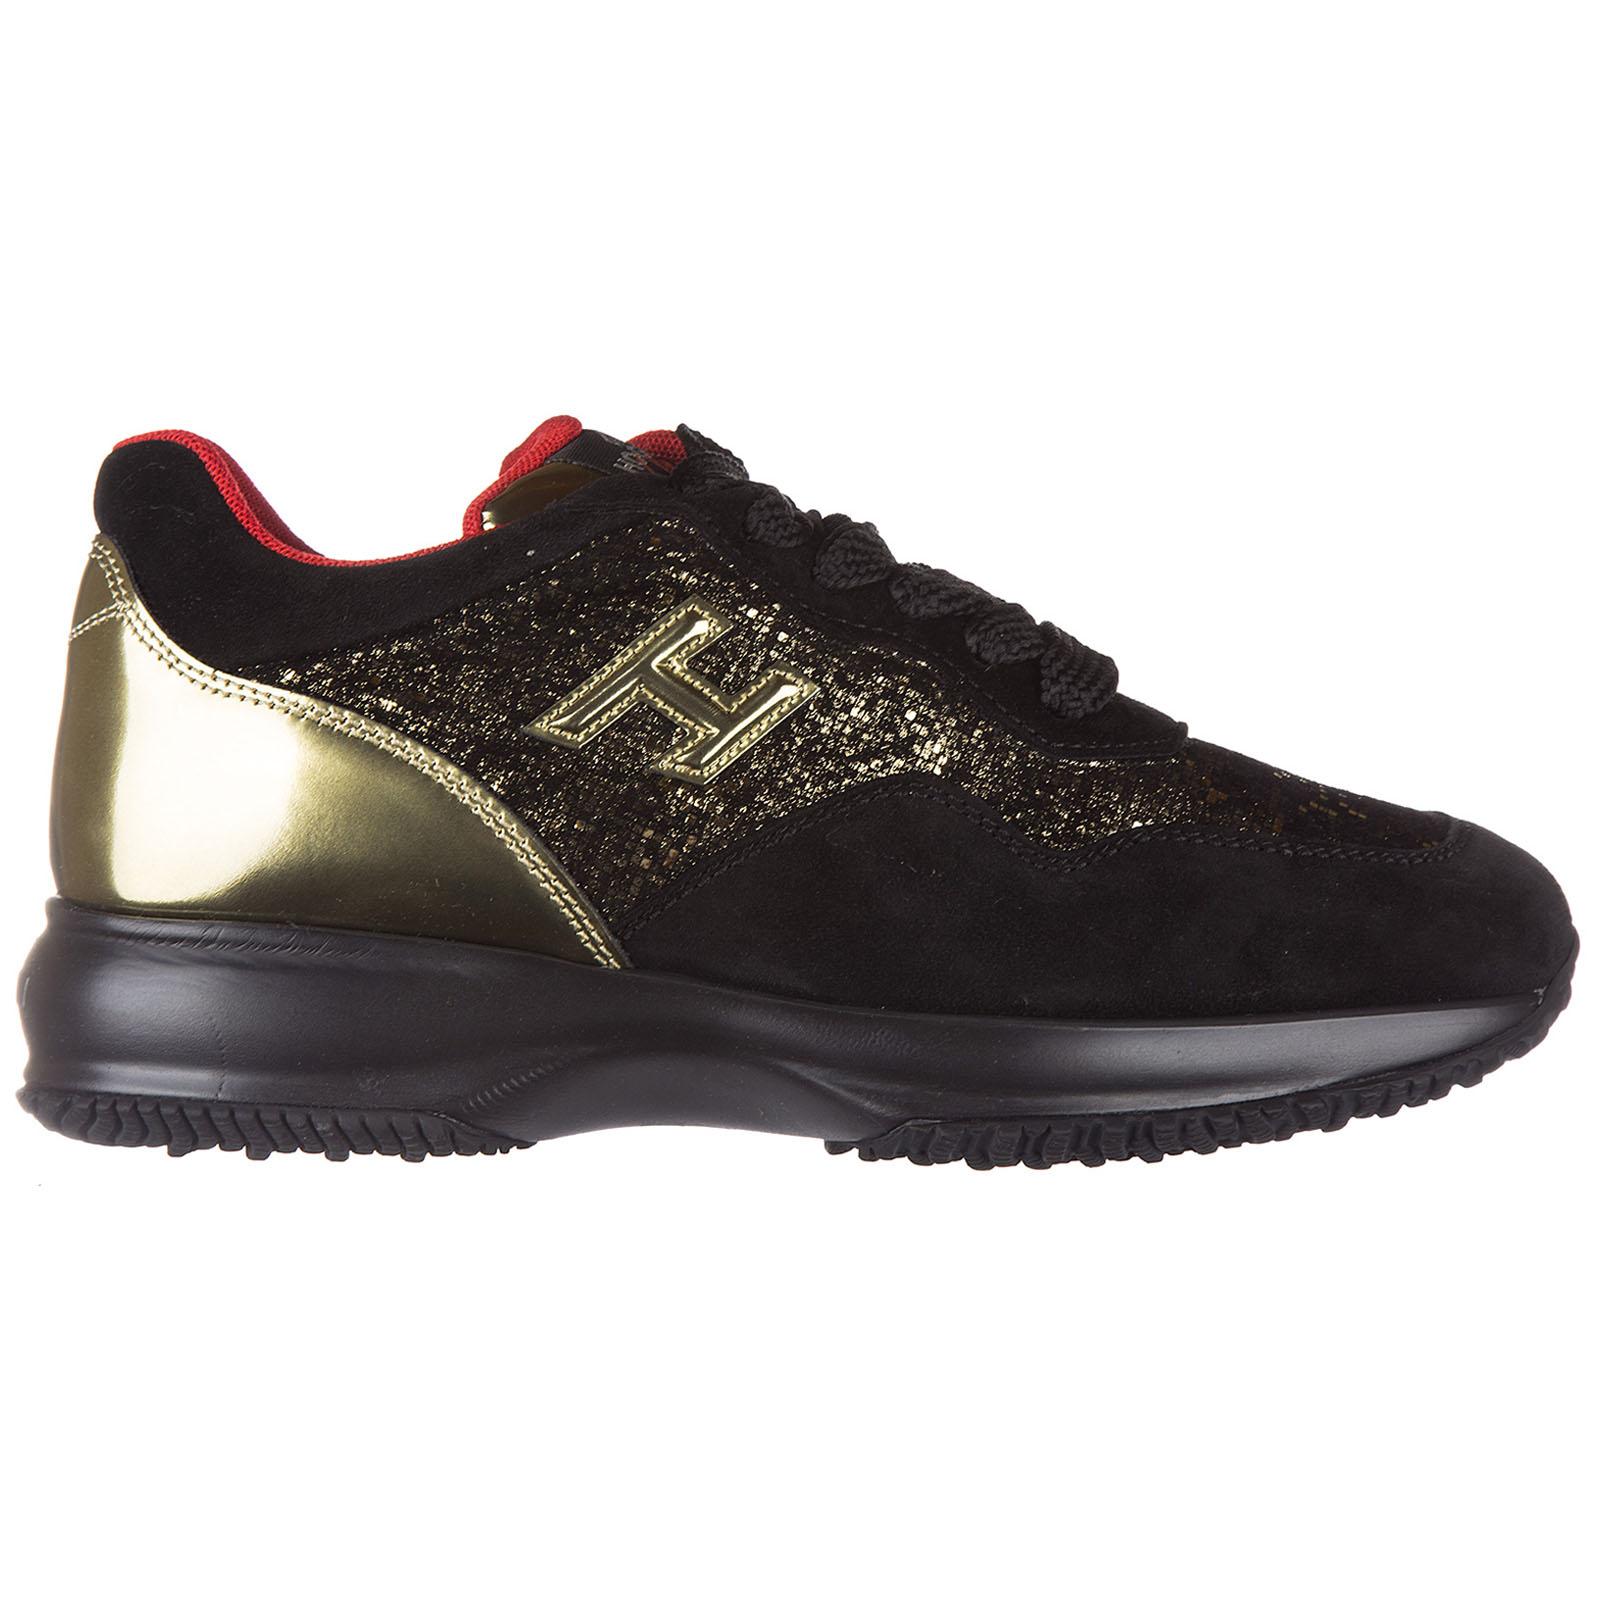 Scarpe sneakers donna camoscio interactive h 3d